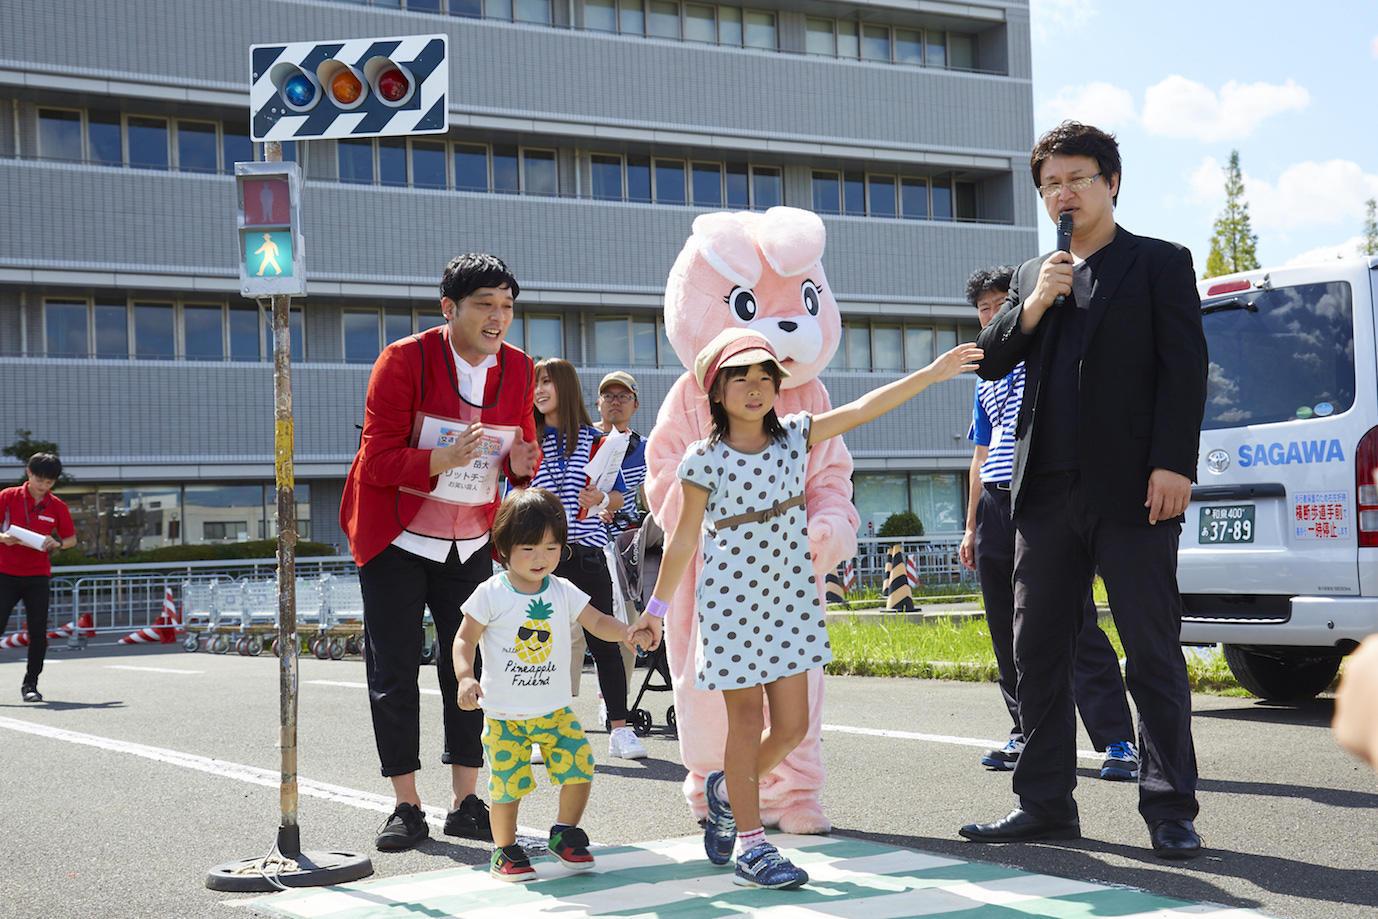 http://news.yoshimoto.co.jp/20181012090213-95d6400394ea828995d57ff58726d686d1800918.jpg